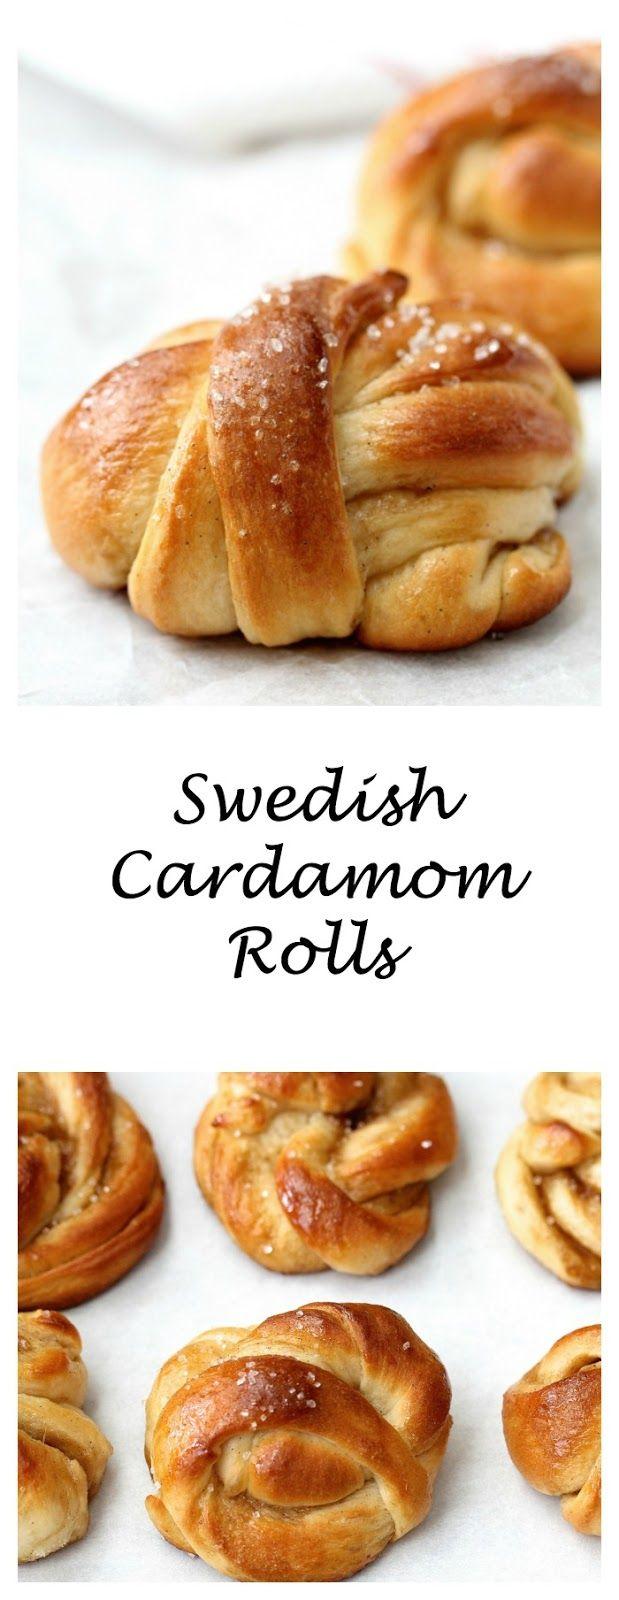 Kardemummabullar | Swedish Cardamom Rolls from Karen's Kitchen Stories